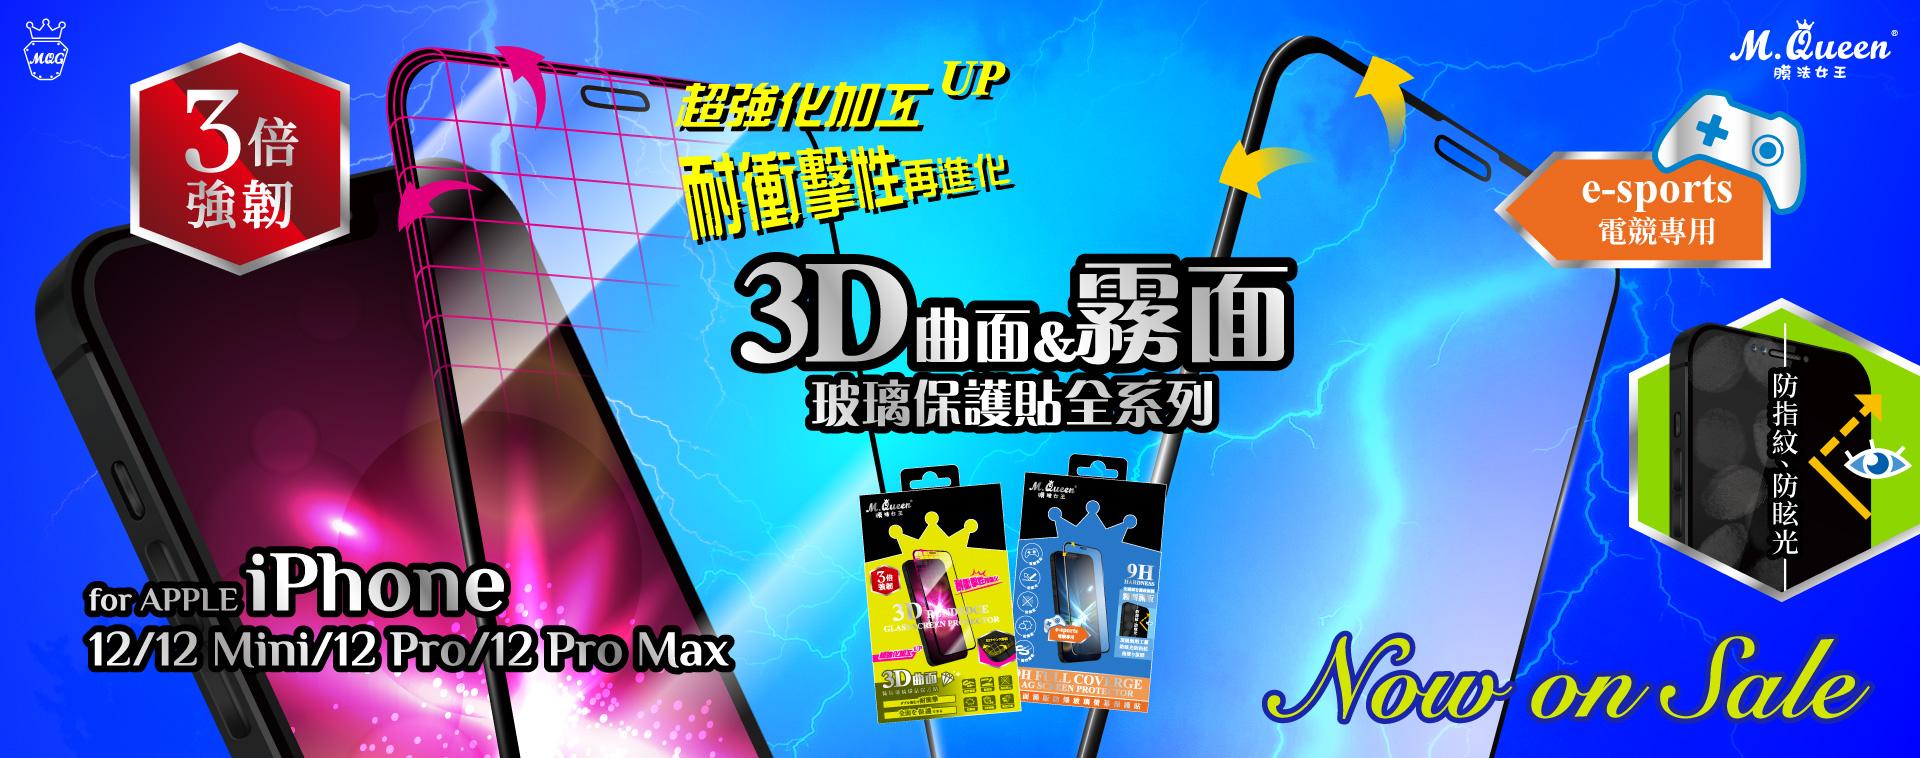 iPhone-12-上市Banner